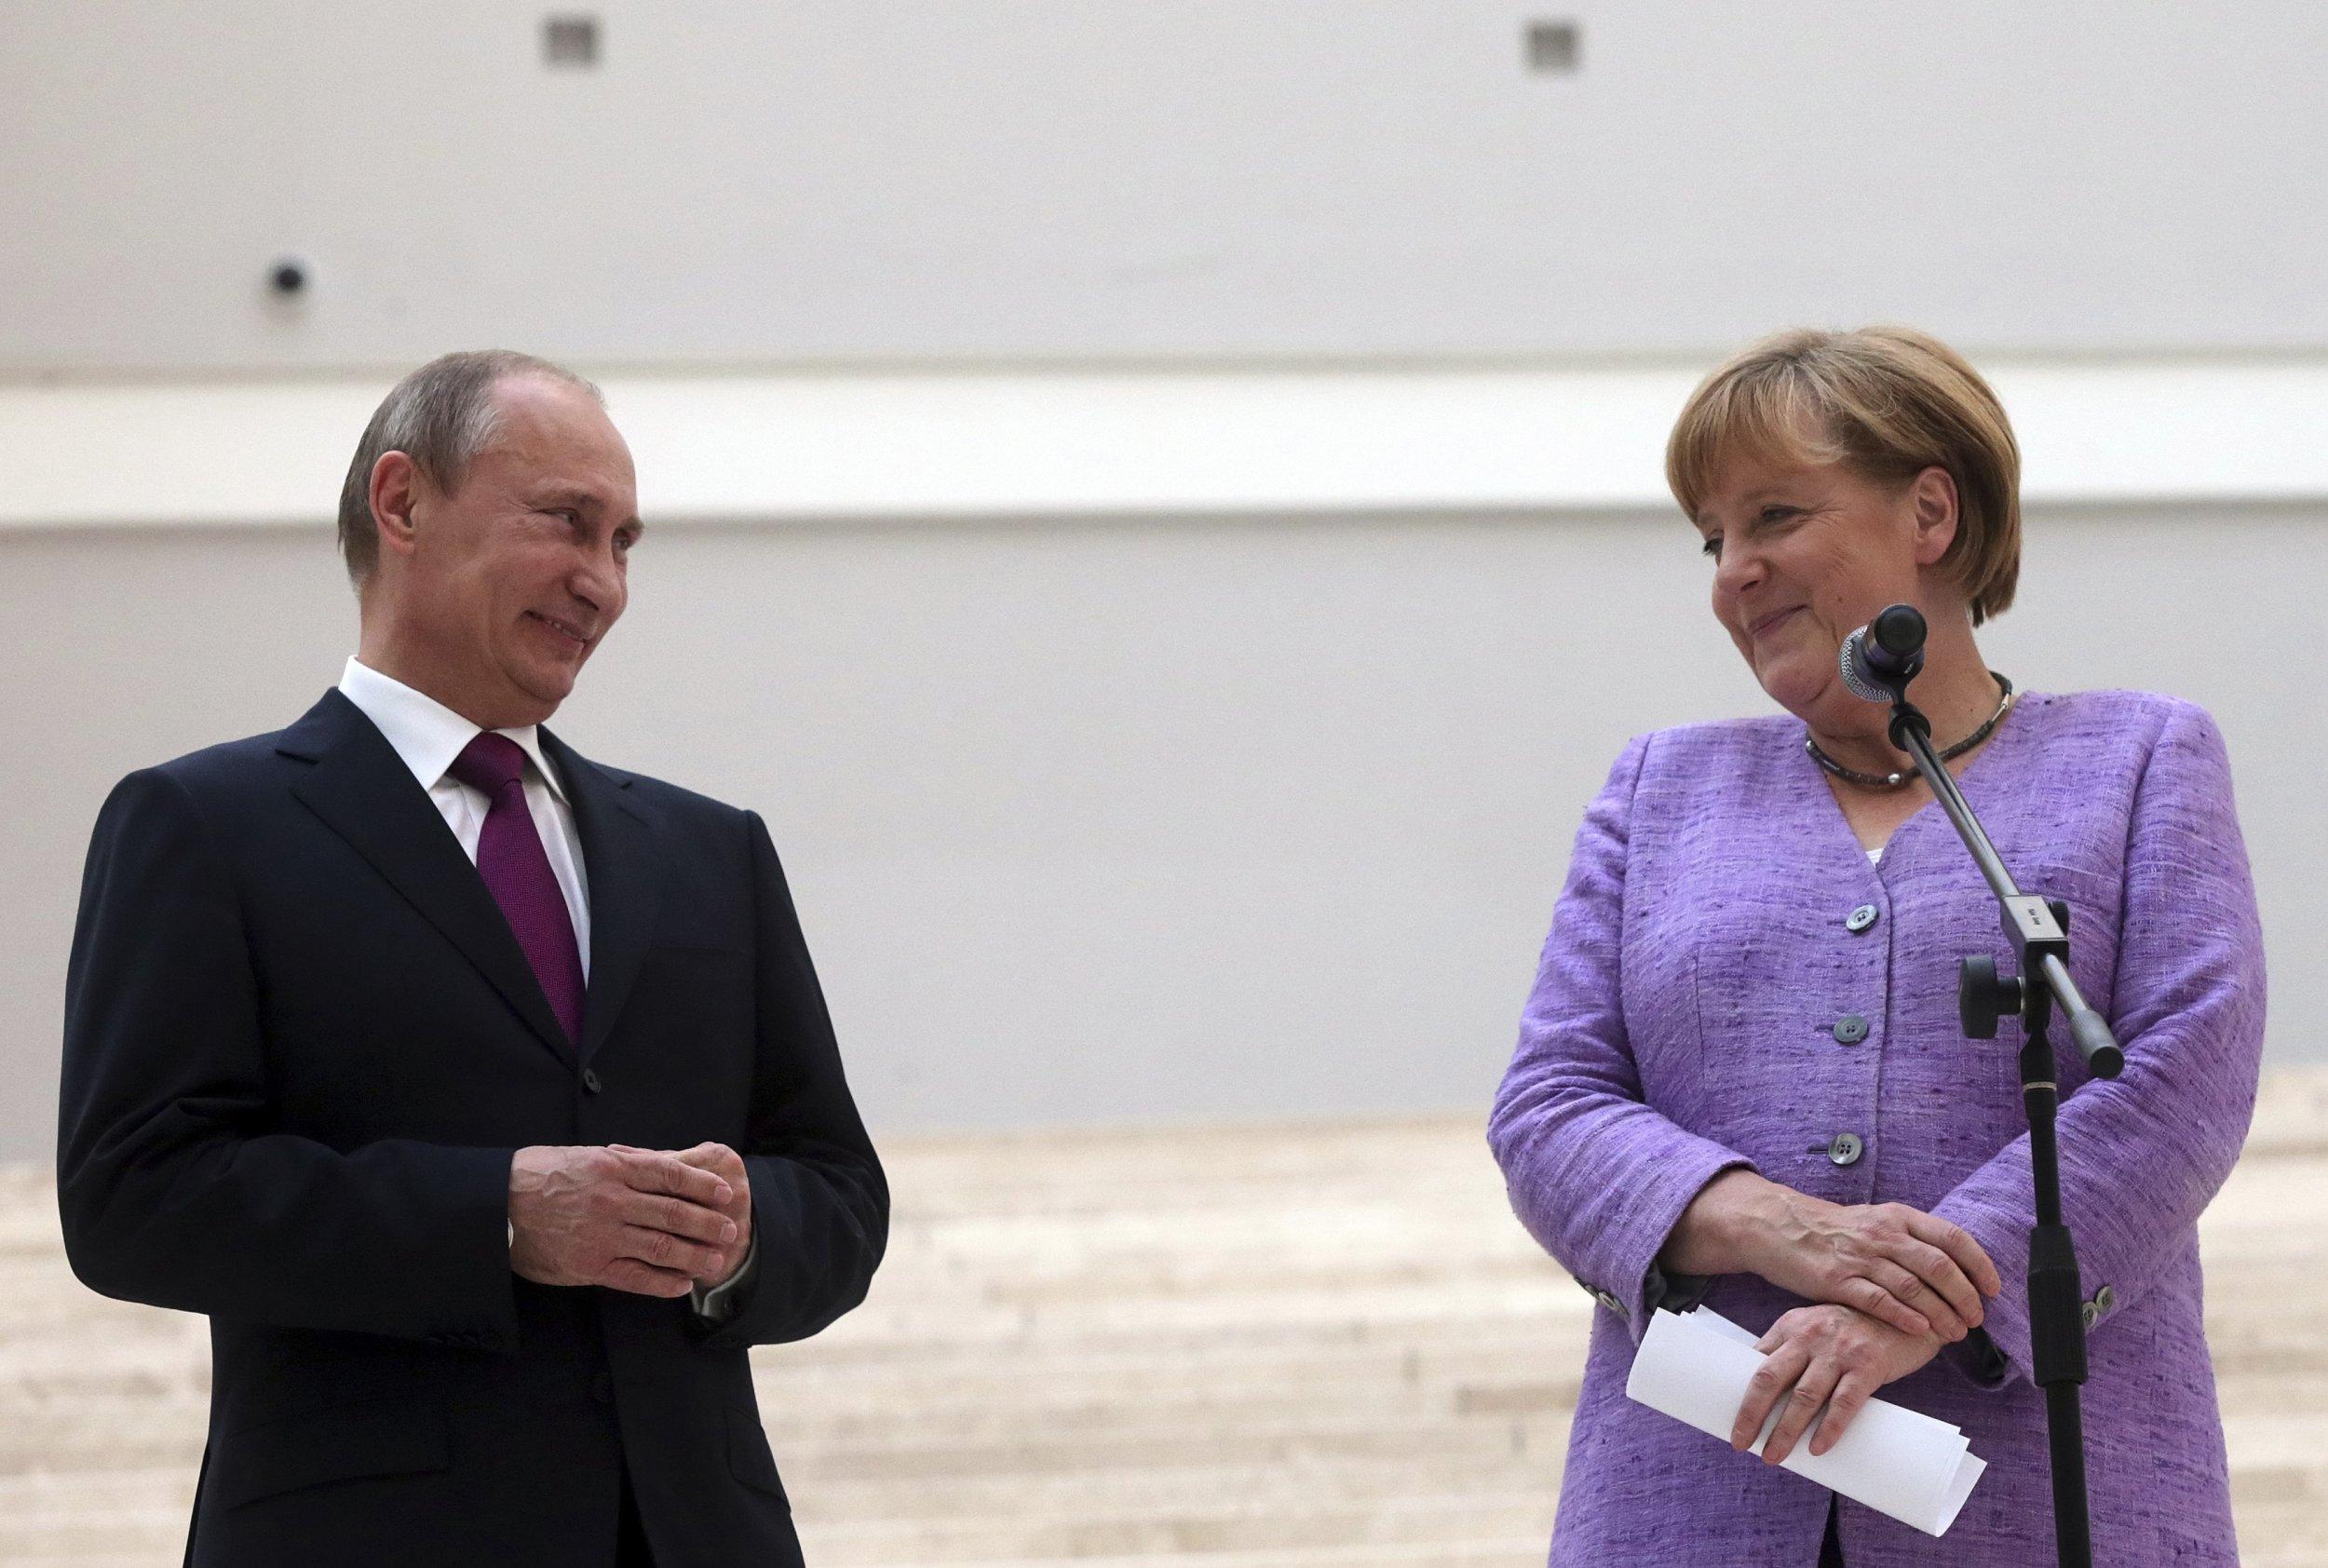 Germany's Russian Rethink: How Merkel Lost Faith in Putin | 3500 x 2357 jpeg 2855kB